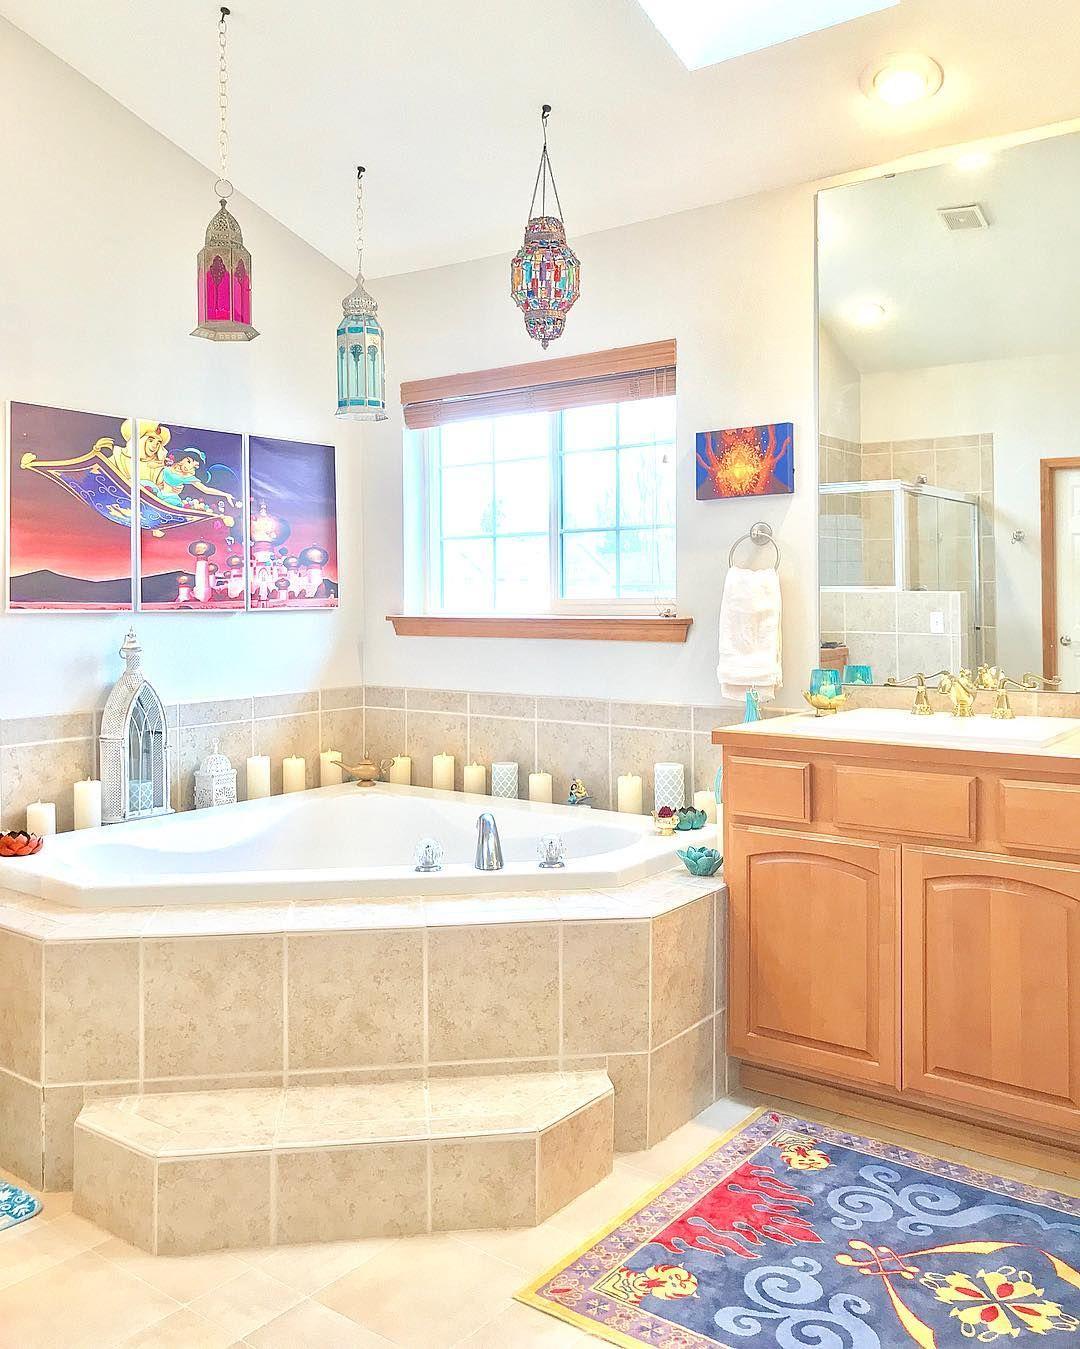 𝕂𝕖𝕝𝕤𝕖𝕪 𝕄𝕚𝕔𝕙𝕖𝕝𝕝𝕖 On Instagram Our Aladdin Master Bathroom Is Definitely One Of My Favorite Disney Room Decor Disney House Ideas Disney Bathroom